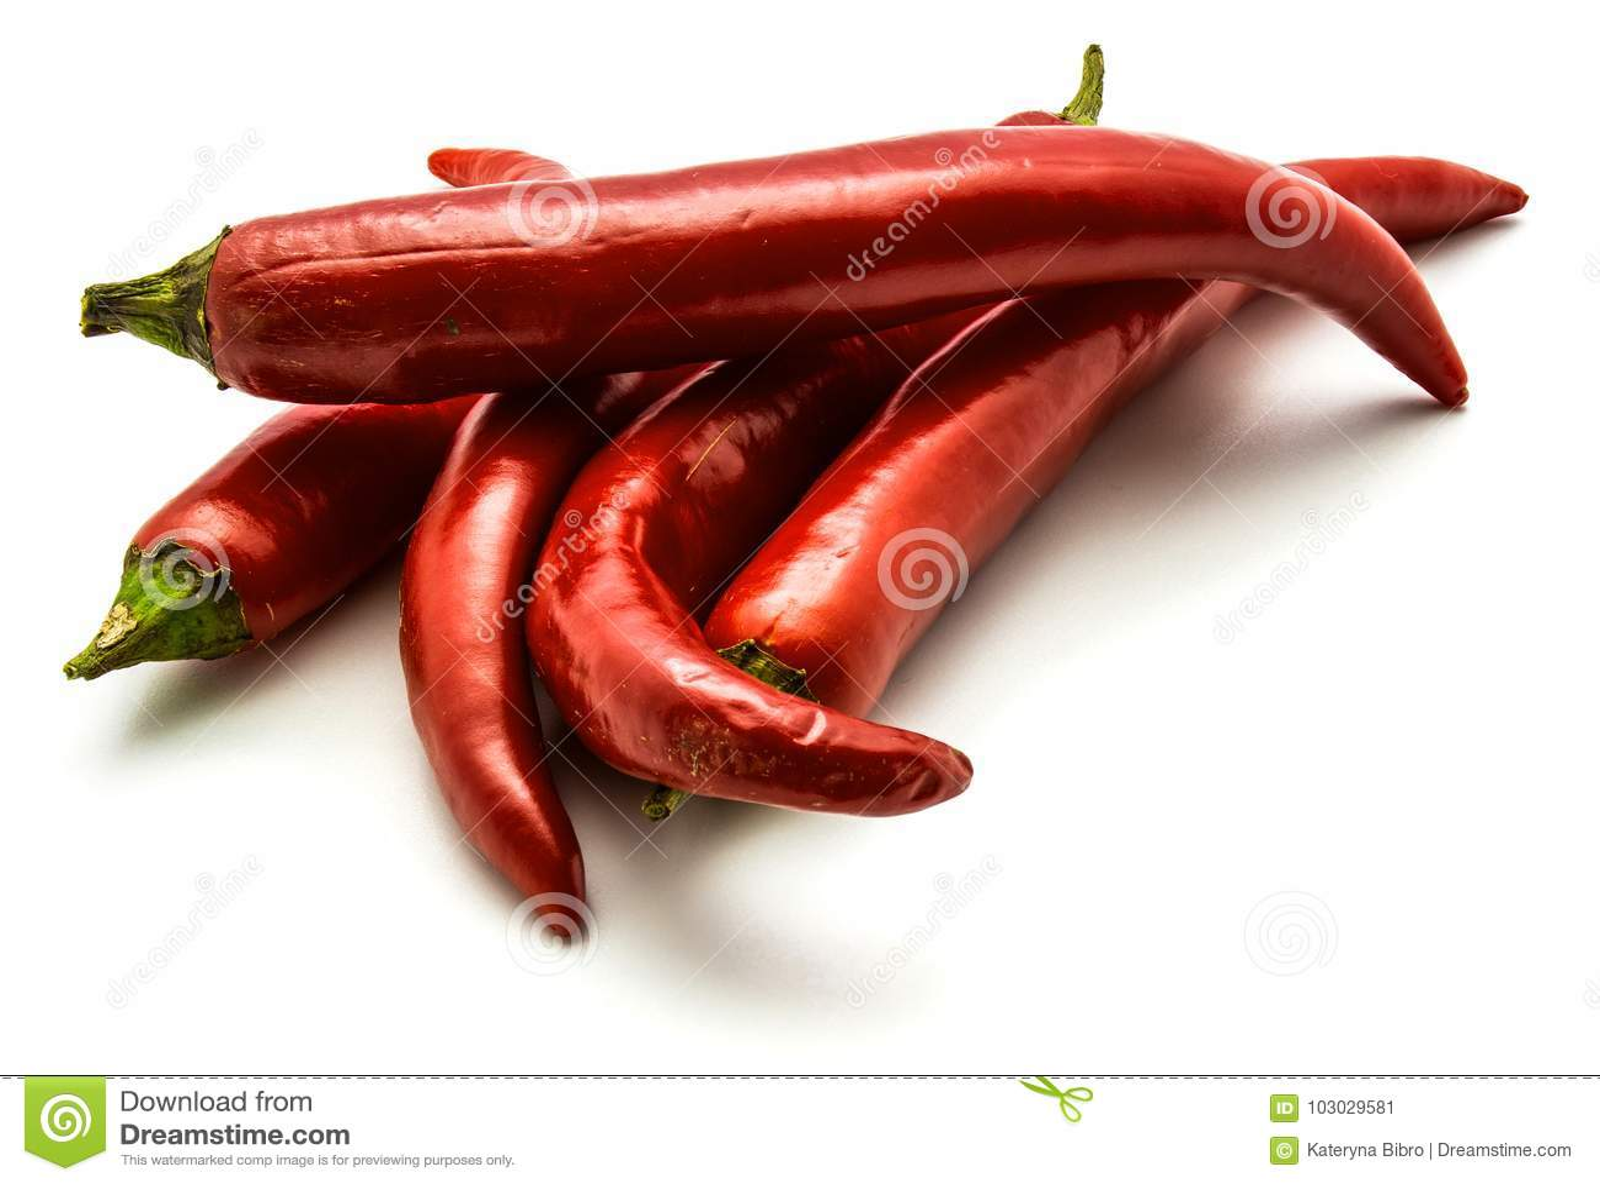 97a2d01cda7c Chilli Pepper stock image. Image of capsicum